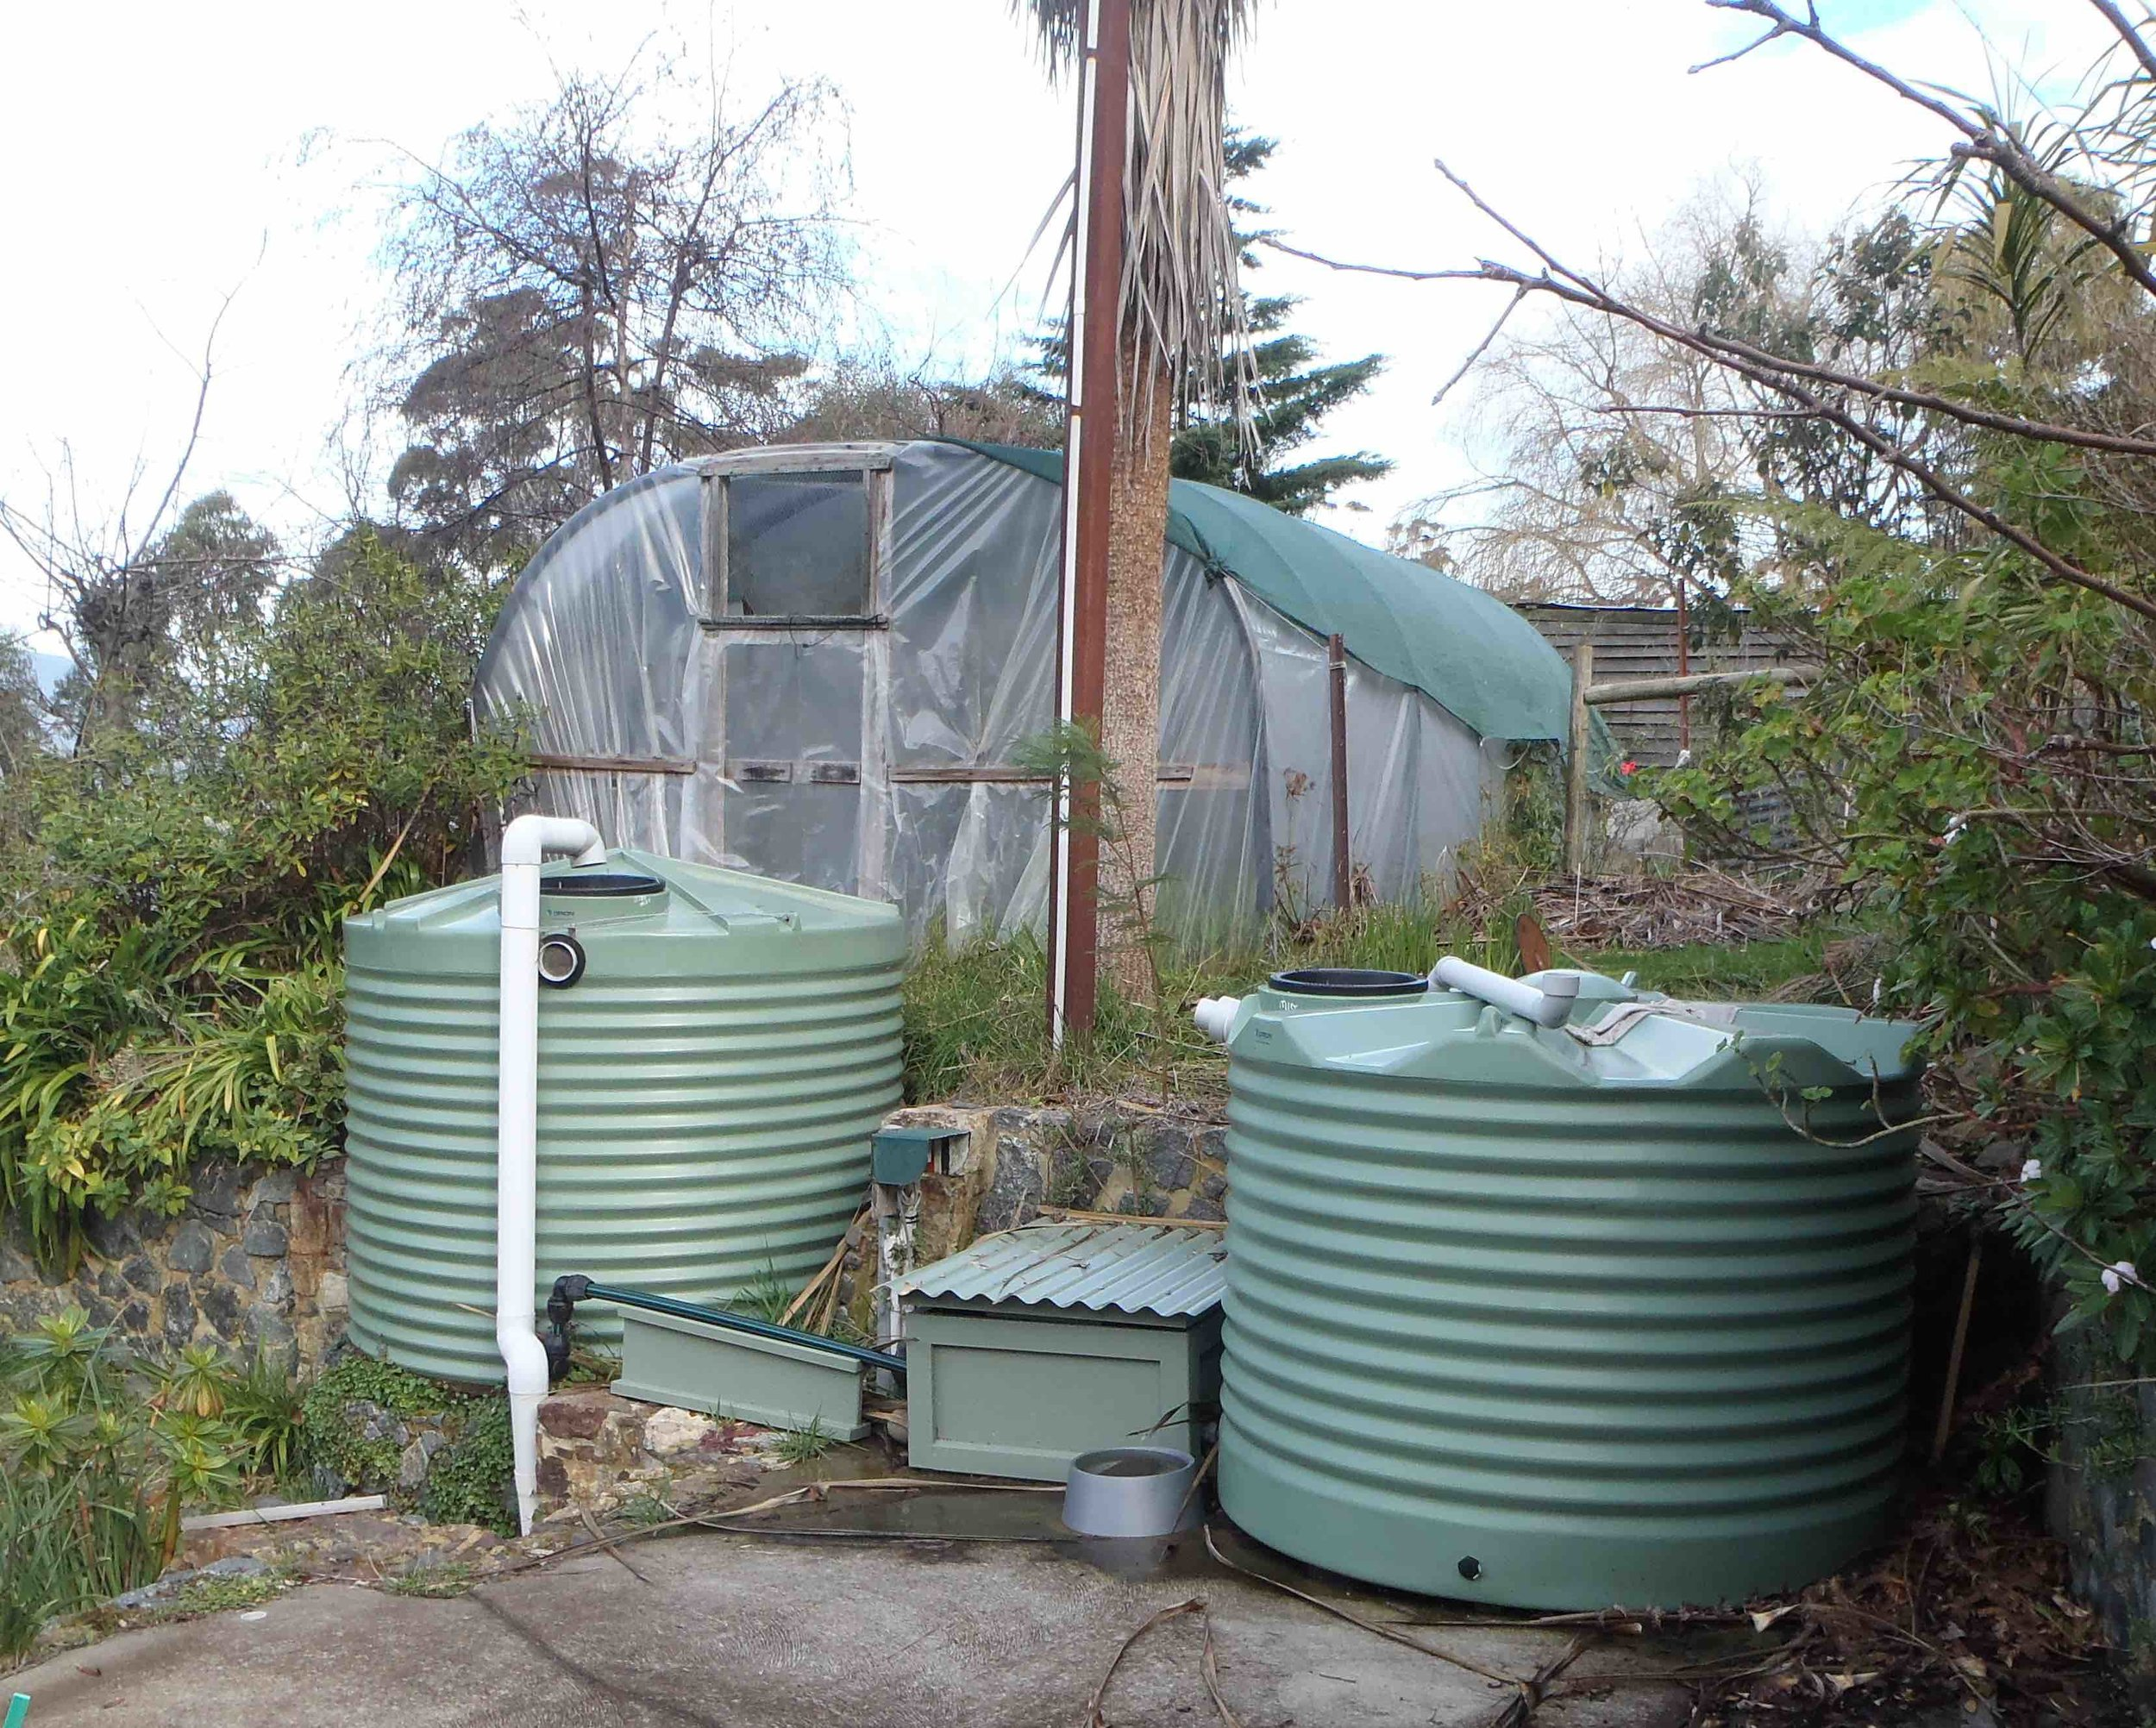 Rainwater storage tanks